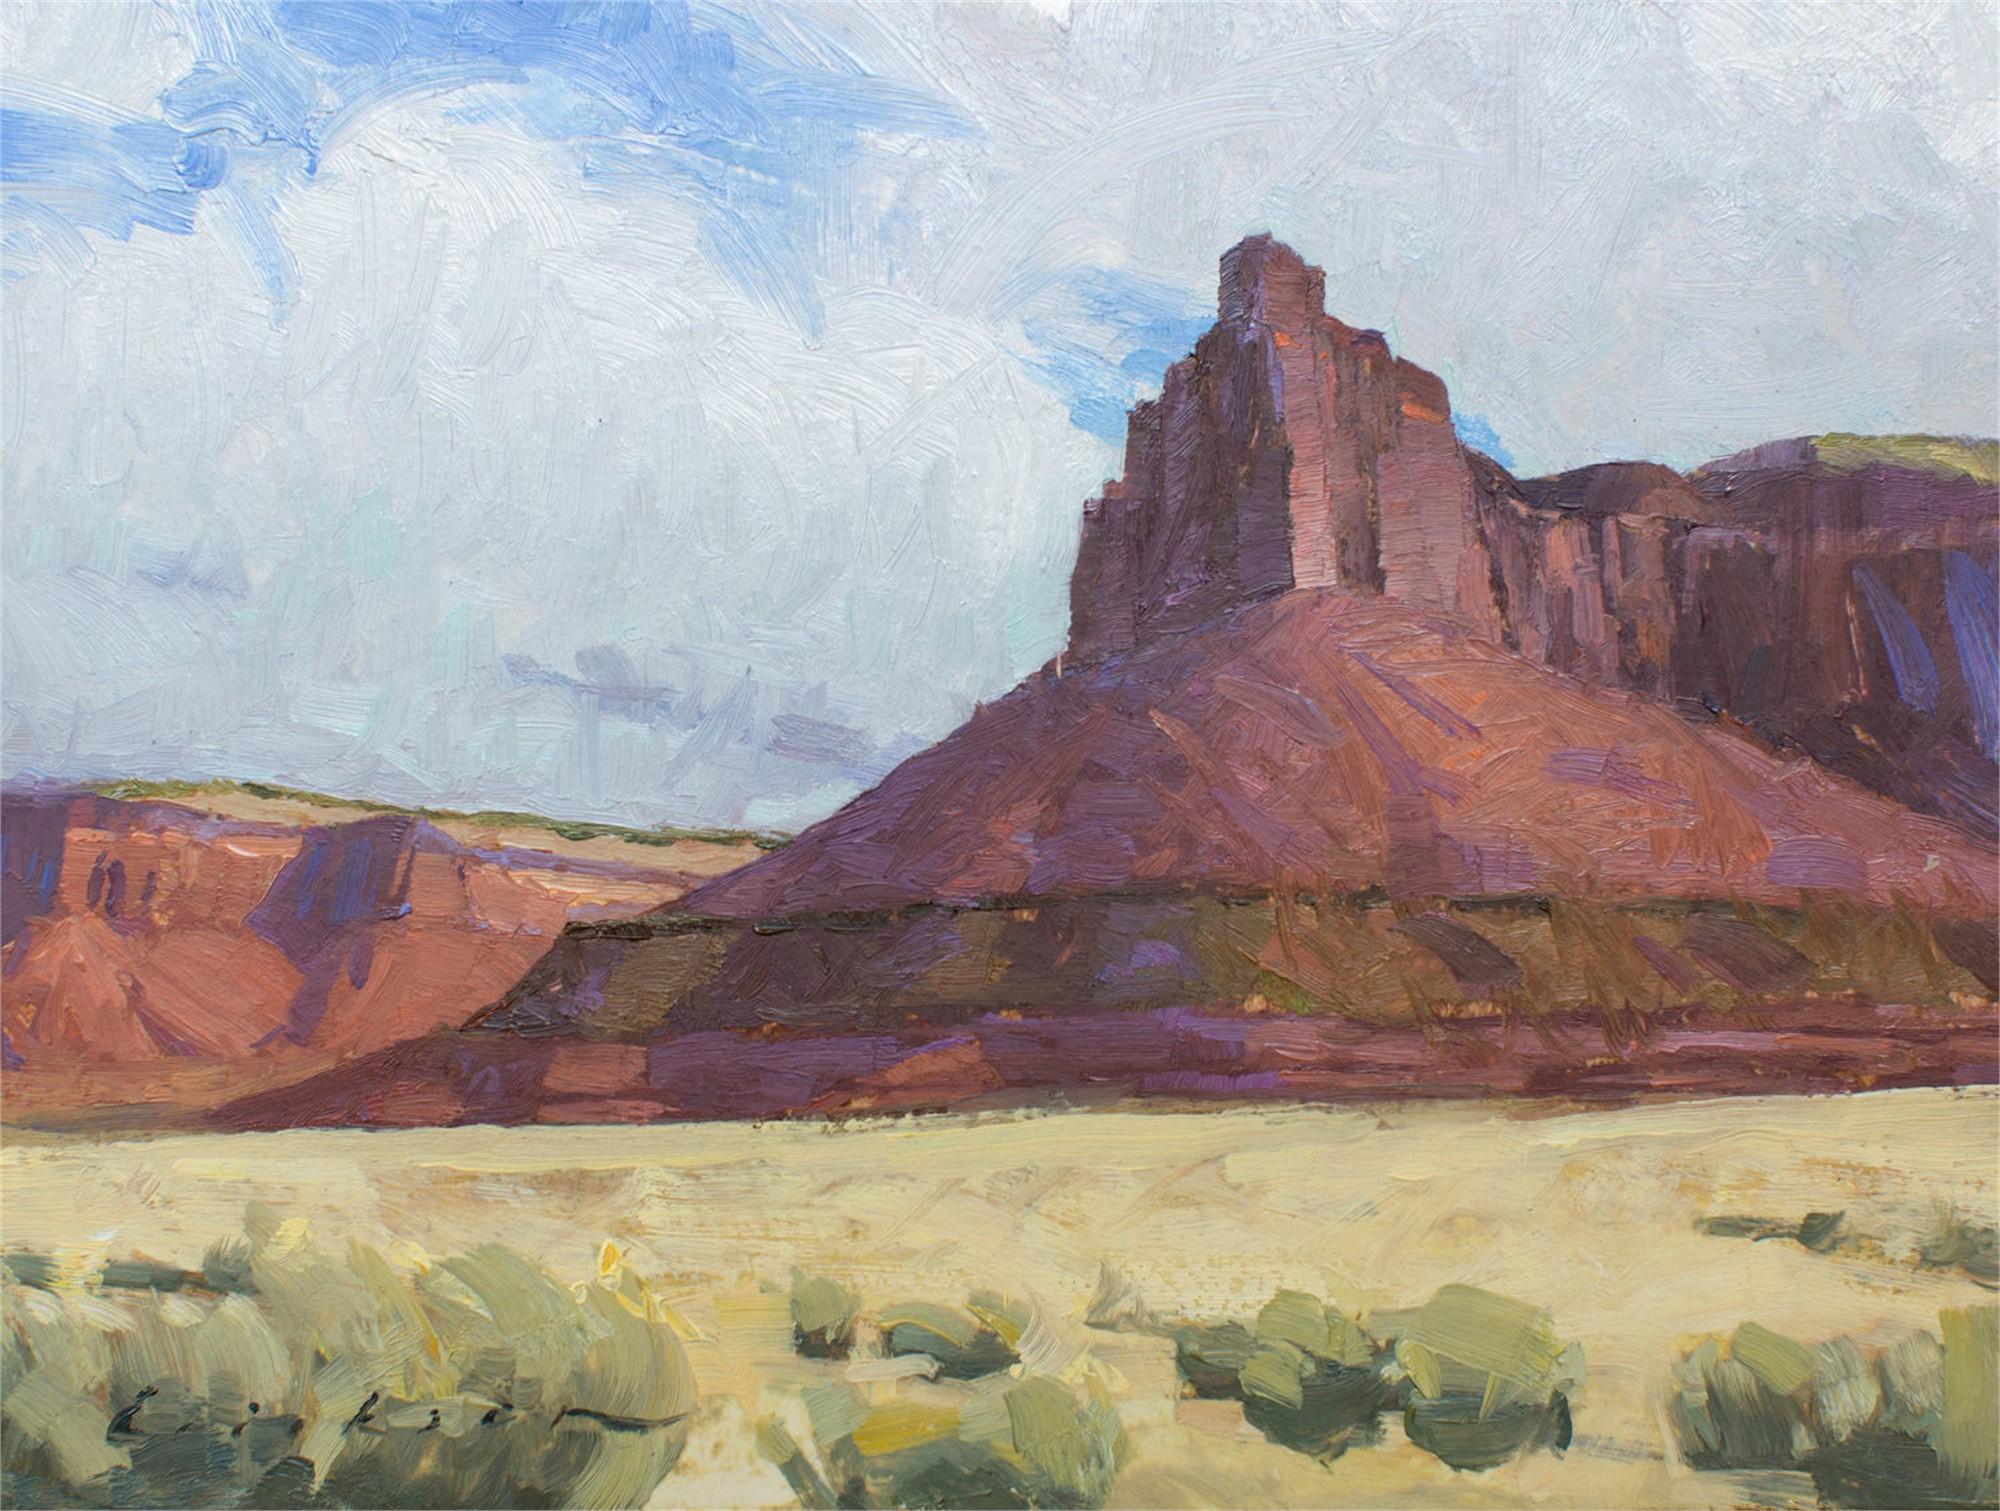 Indian Creek by Cody Erickson